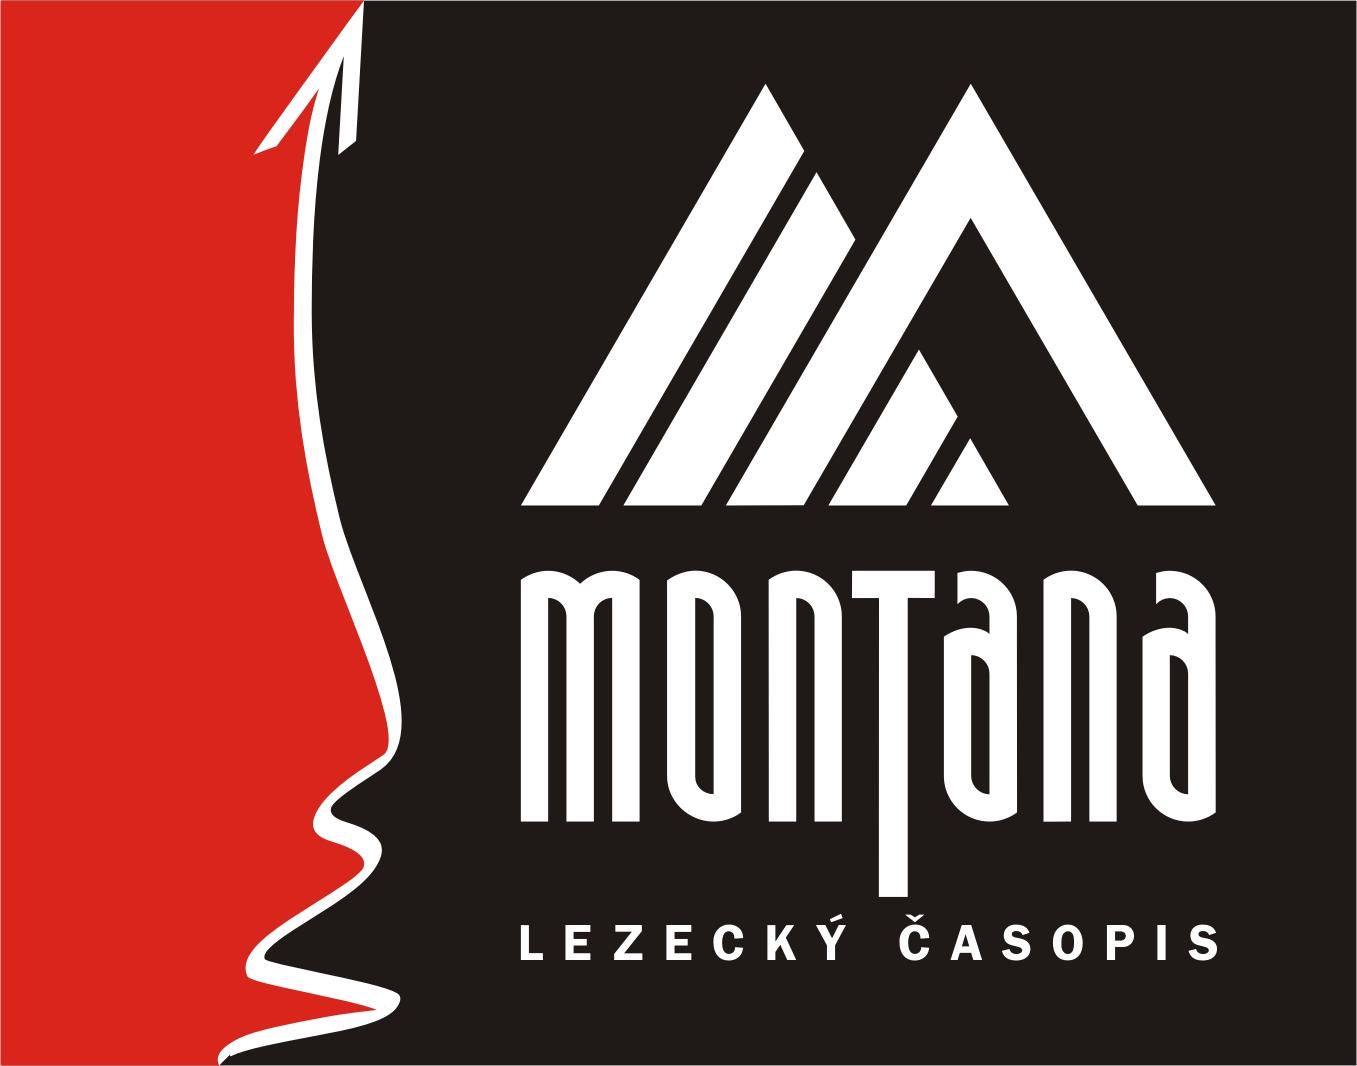 Logo_Montana_Ceske.jpg, 159kB